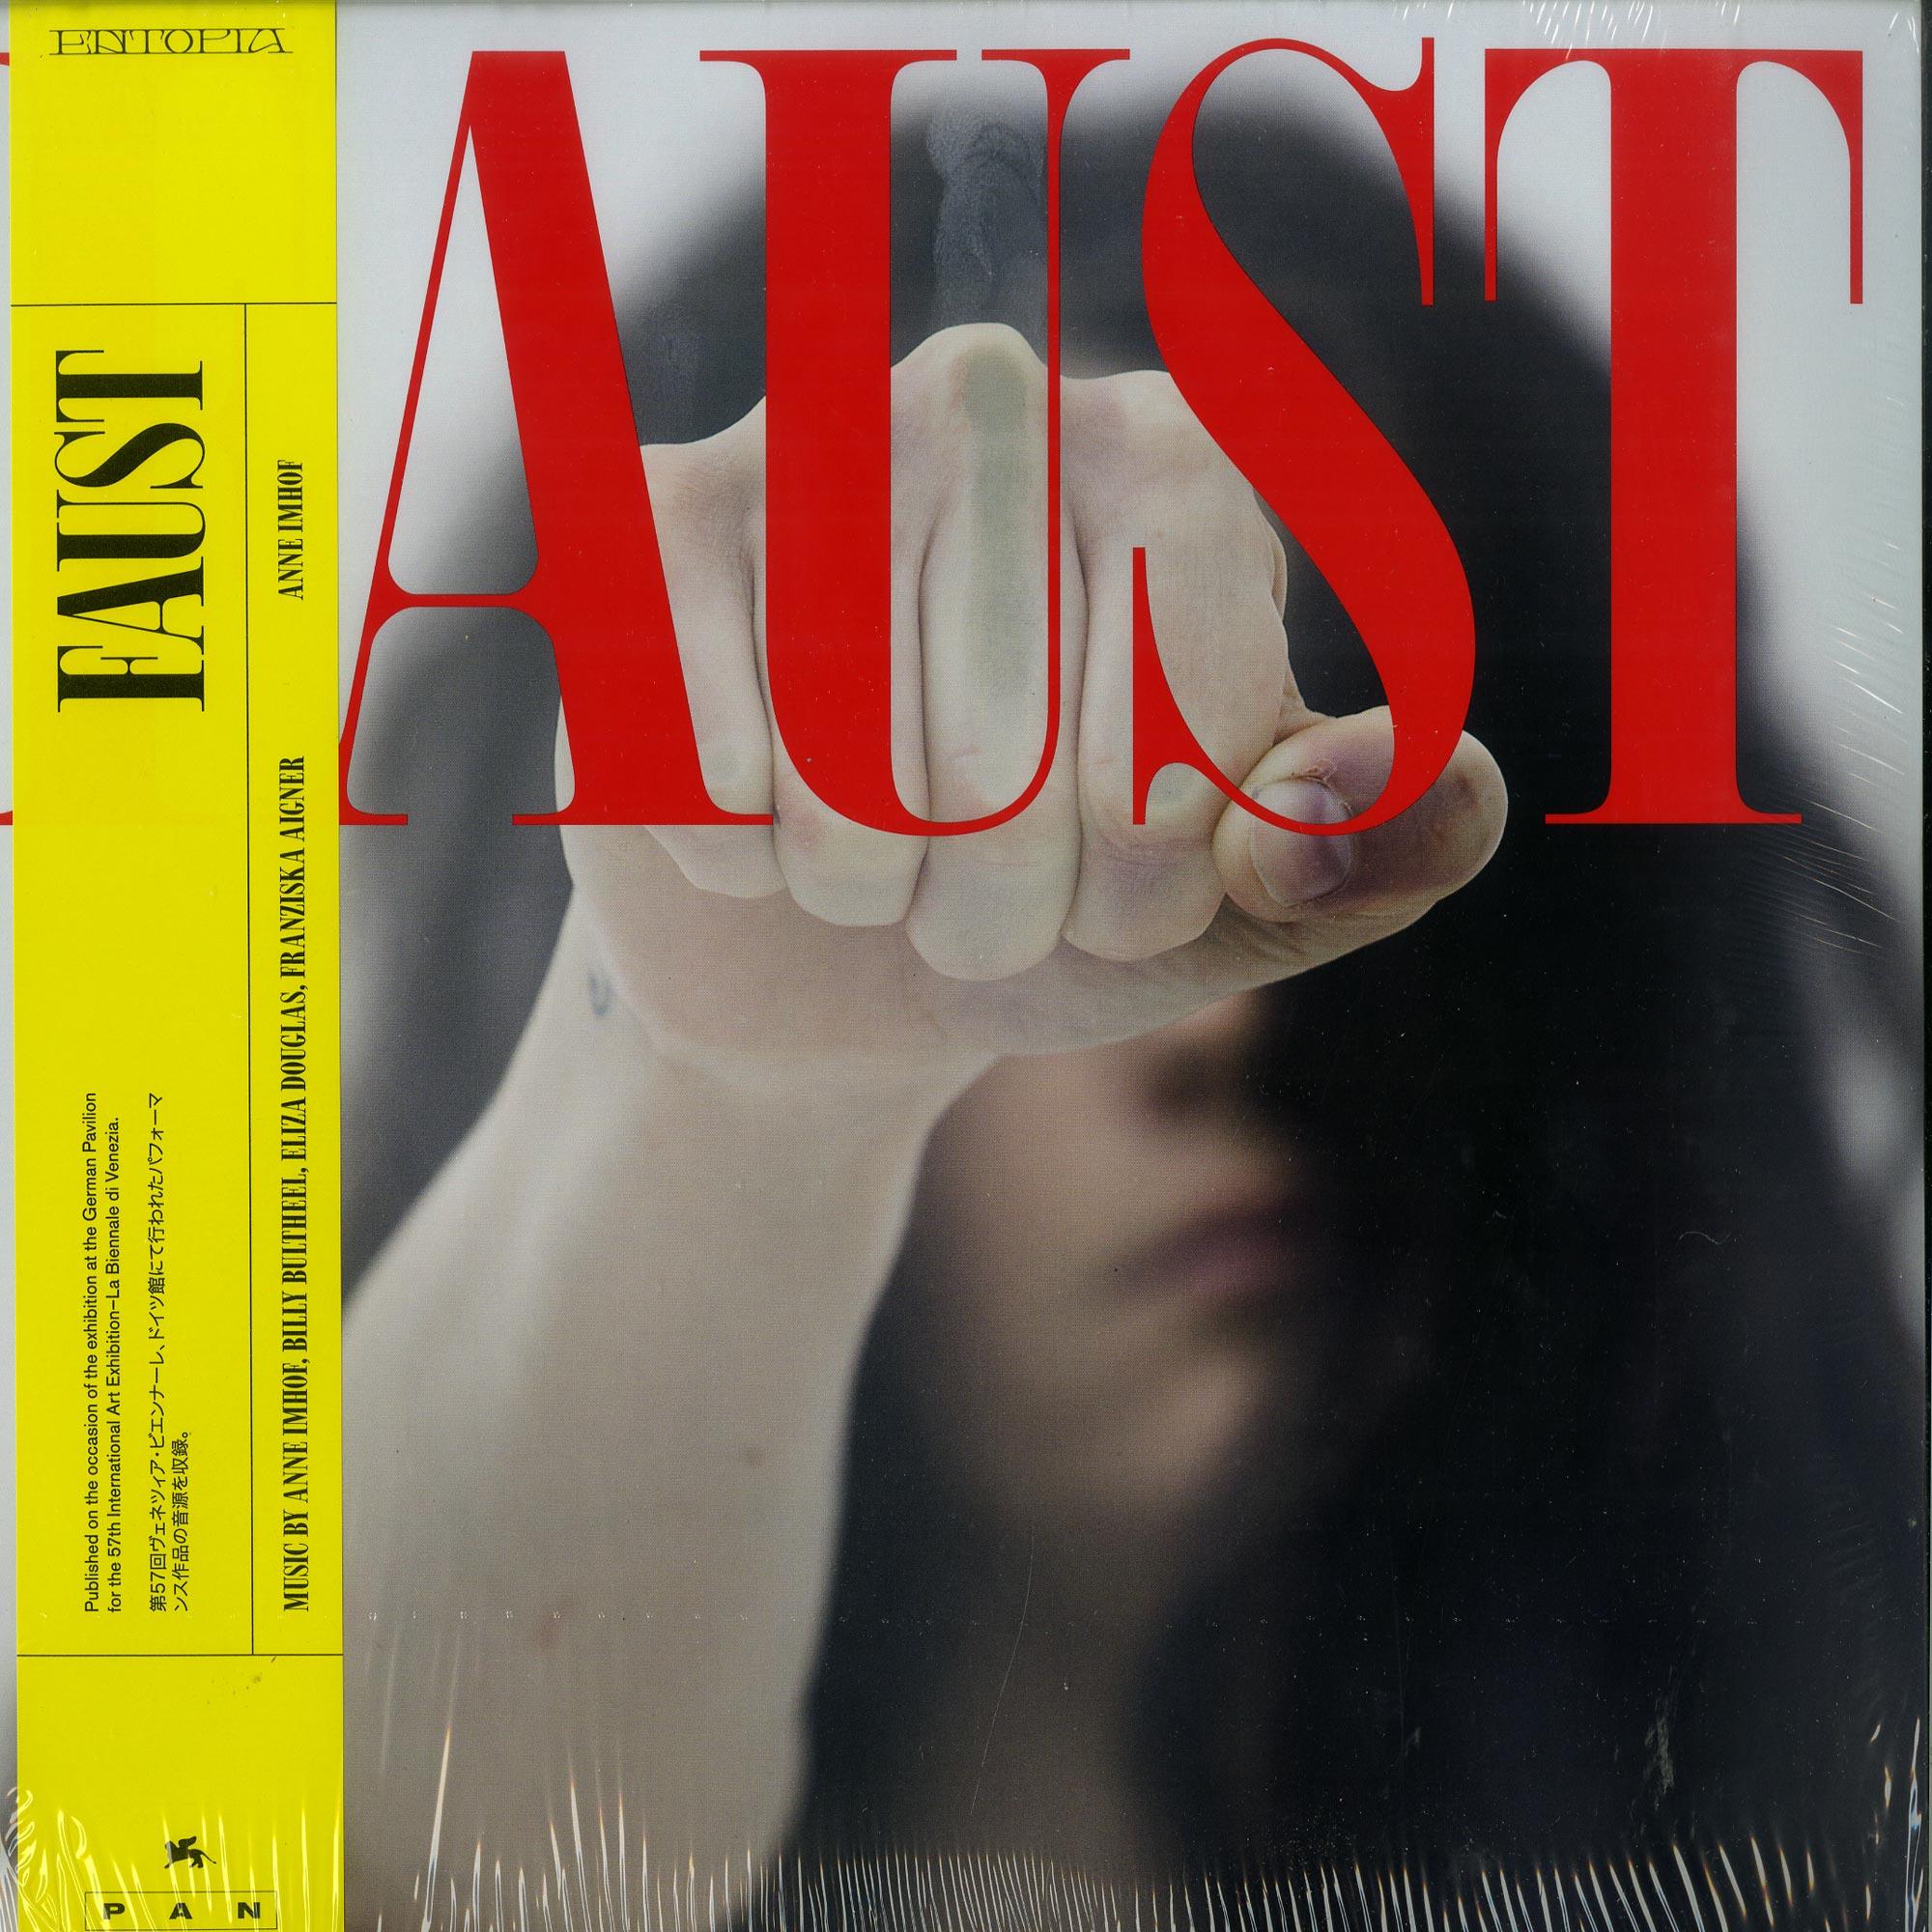 Anne Imhof, Billy Bultheel, Eliza Douglas, Franziska Aigner - FAUST